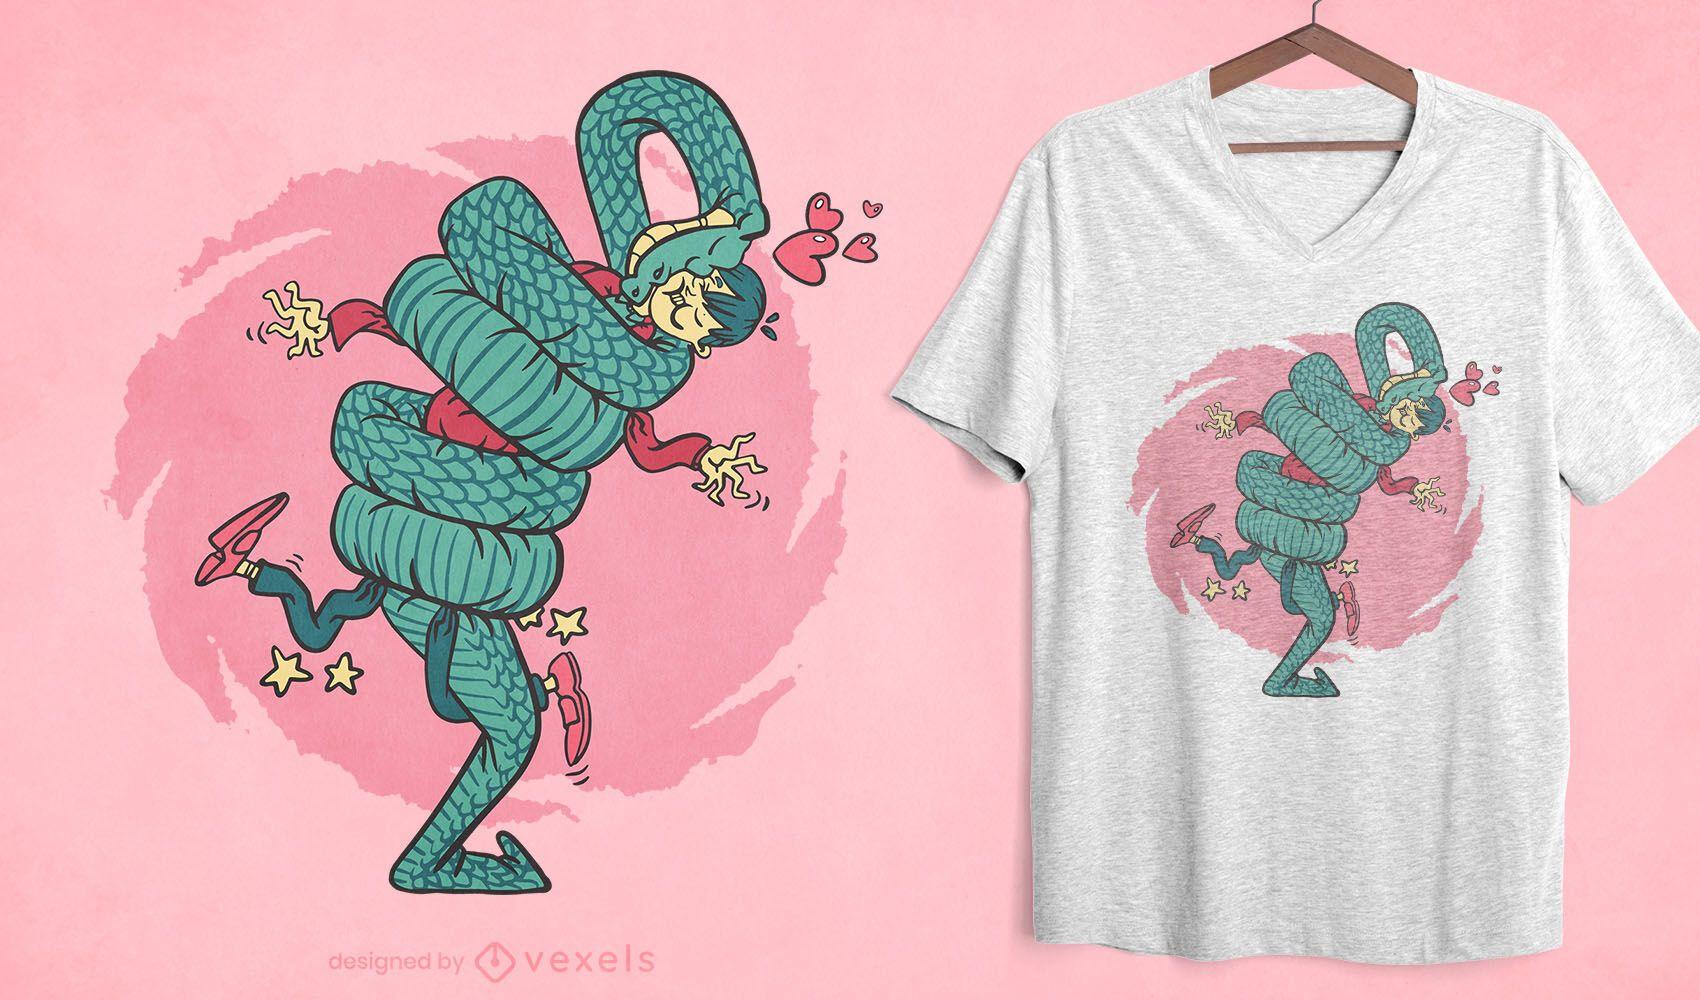 Snake hug t-shirt design